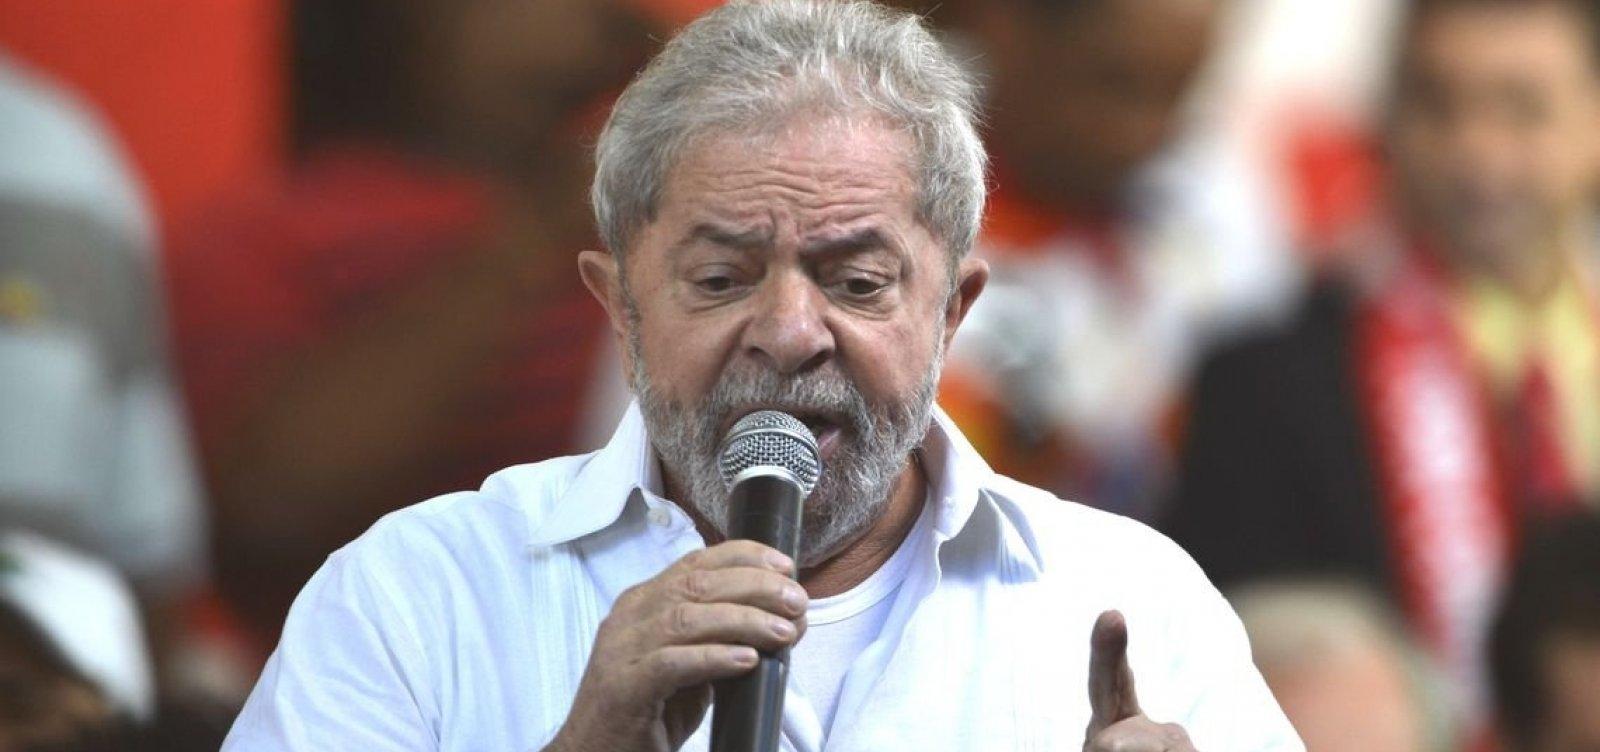 Juiz da Lava Jato nega afastamento do delegado que investiga Lula